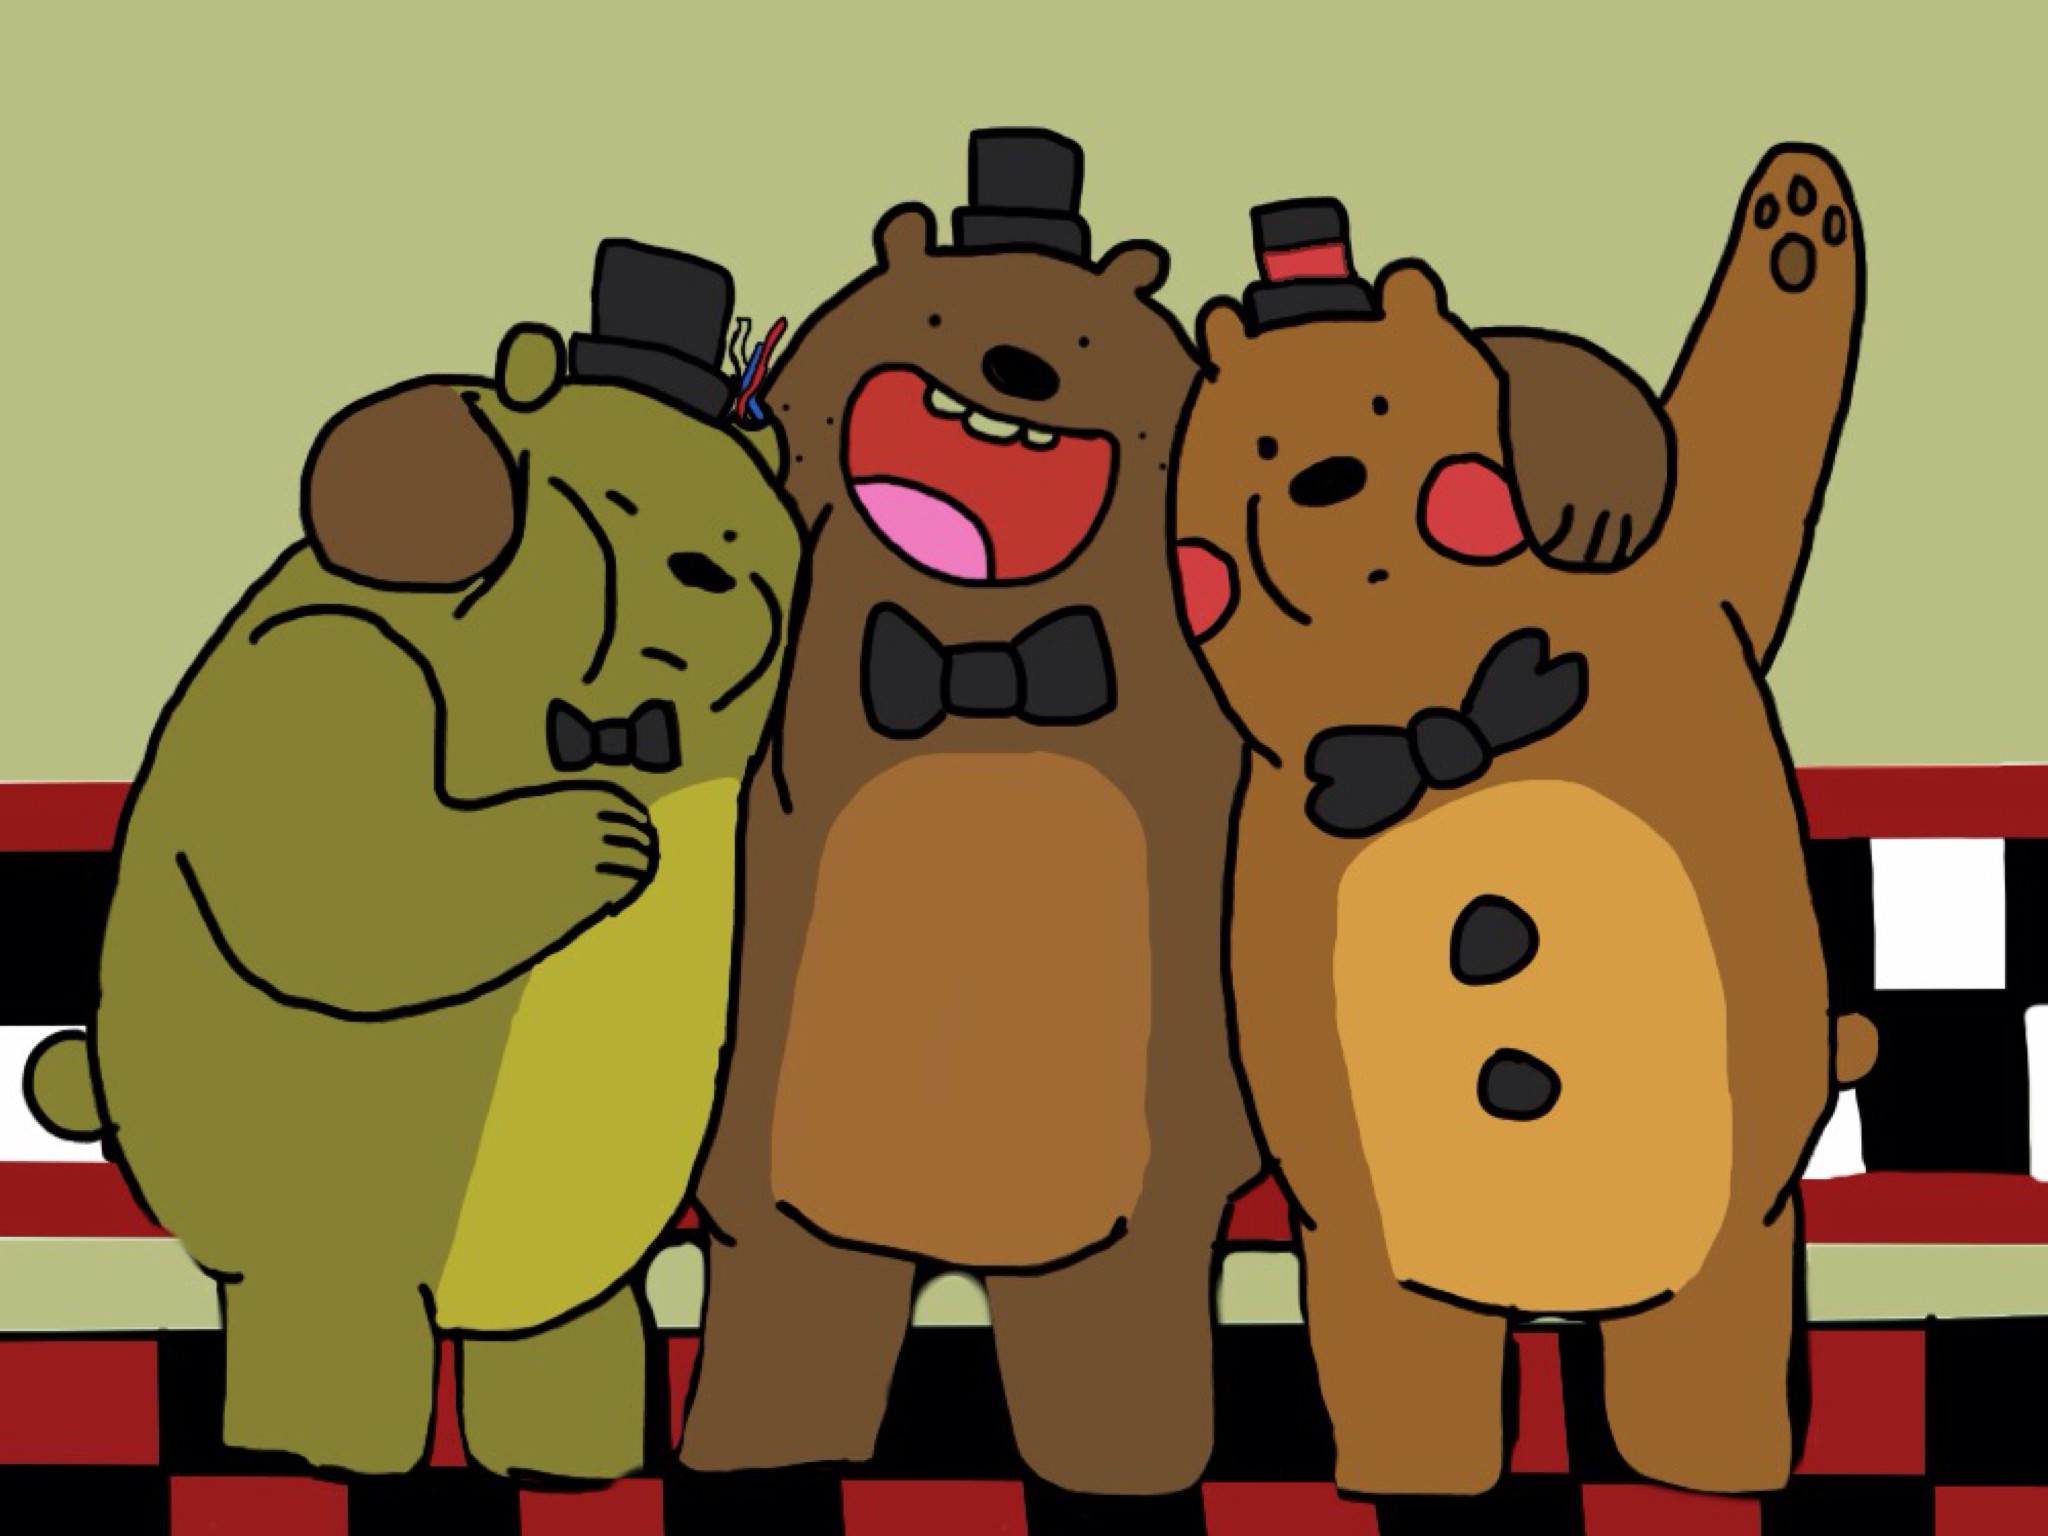 We Bare Bears Fnaf by RainillaXOX We Bare Bears Fnaf by RainillaXOX